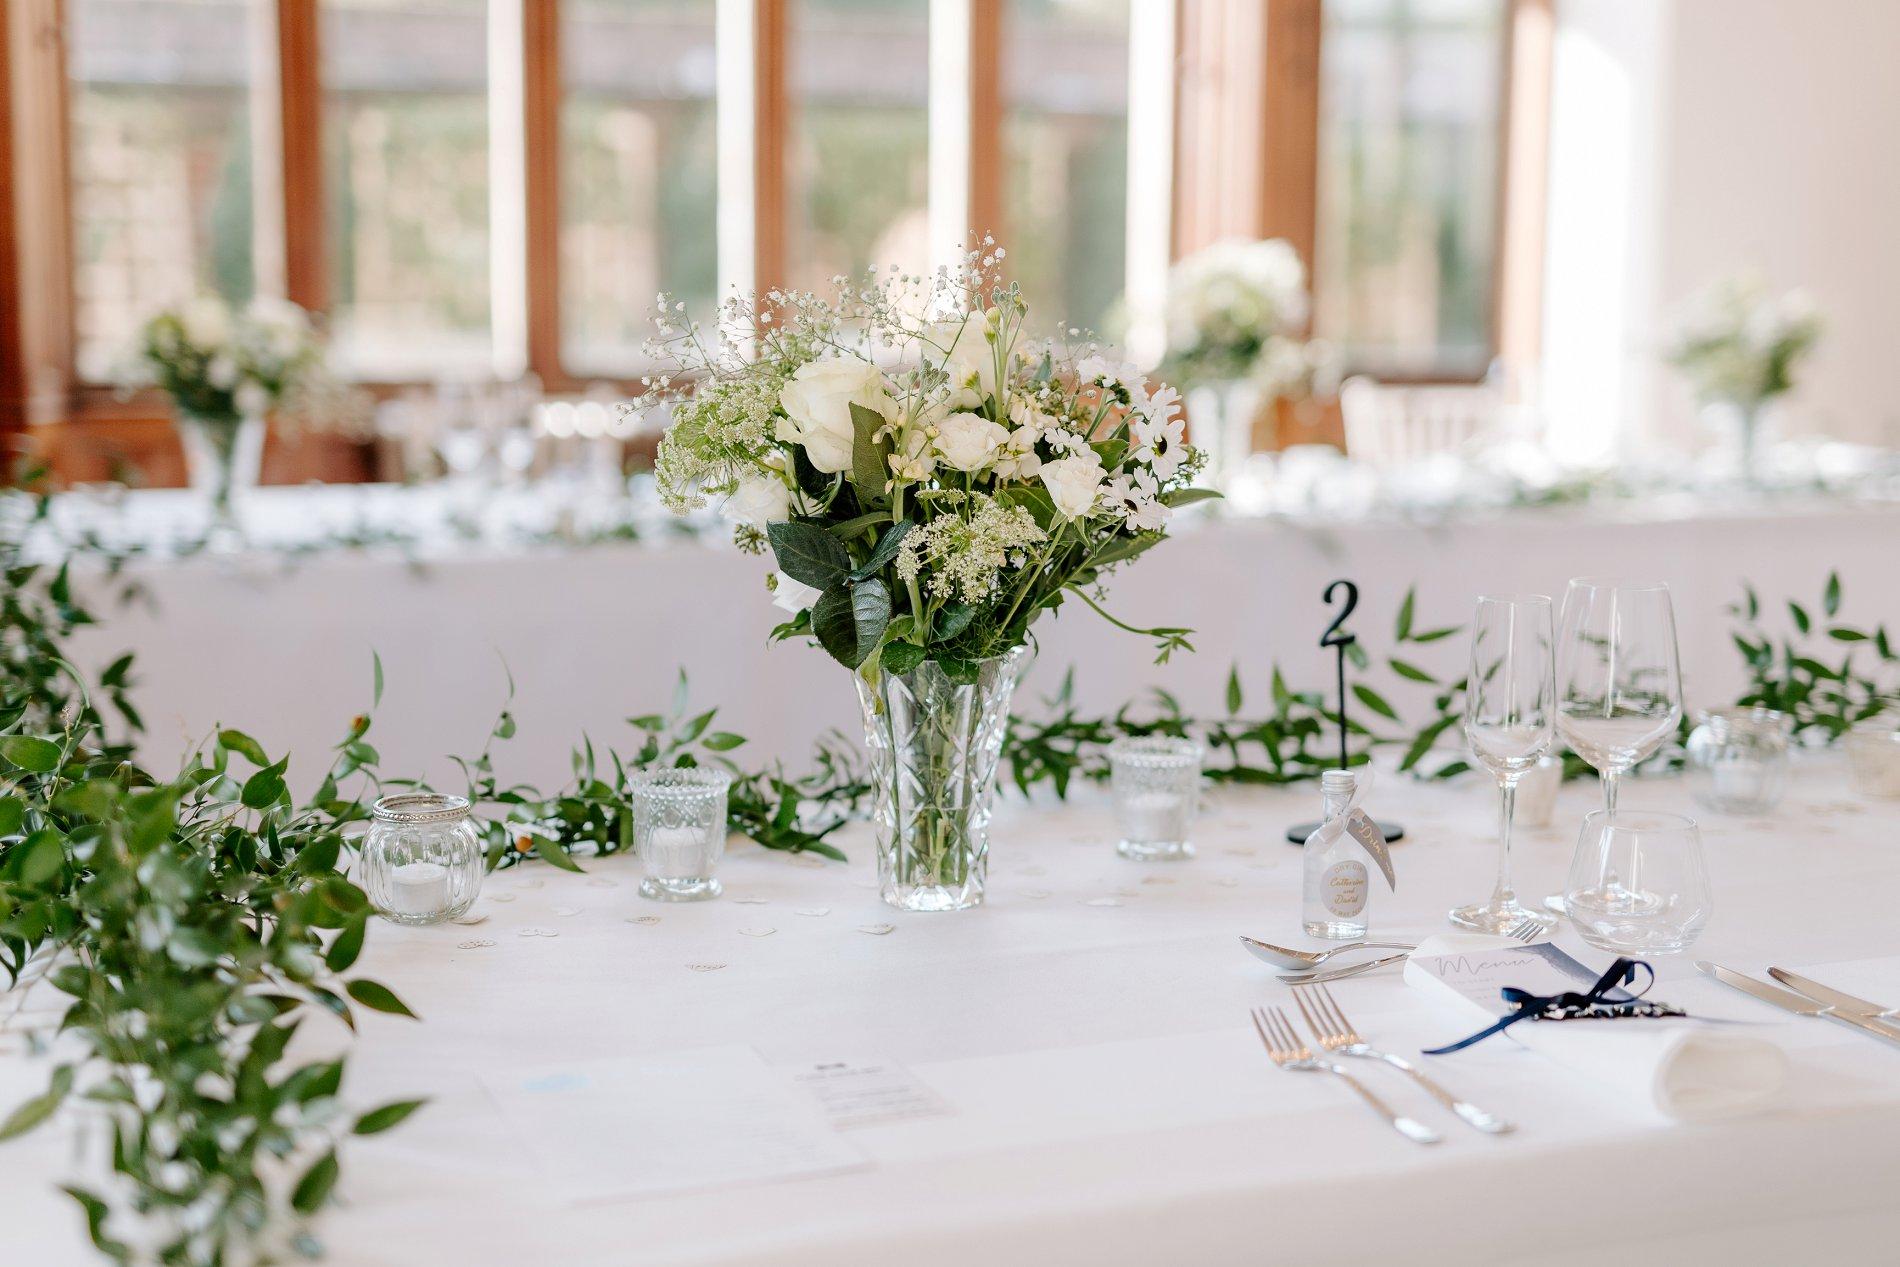 An Elegant White Wedding at Thicket Priory (c) Carla Whittingham Photography (7)